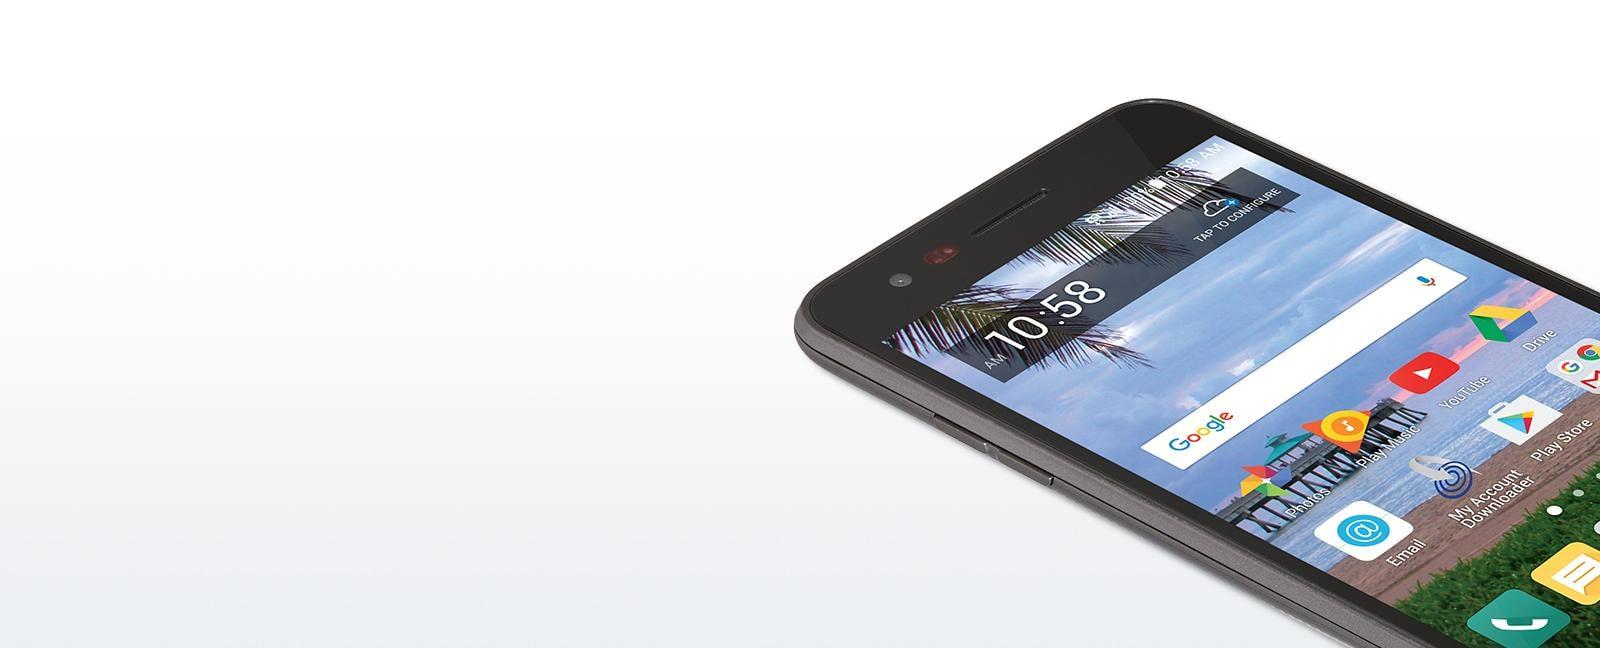 LG Rebel™ 2 LTE (CDMA) | TracFone